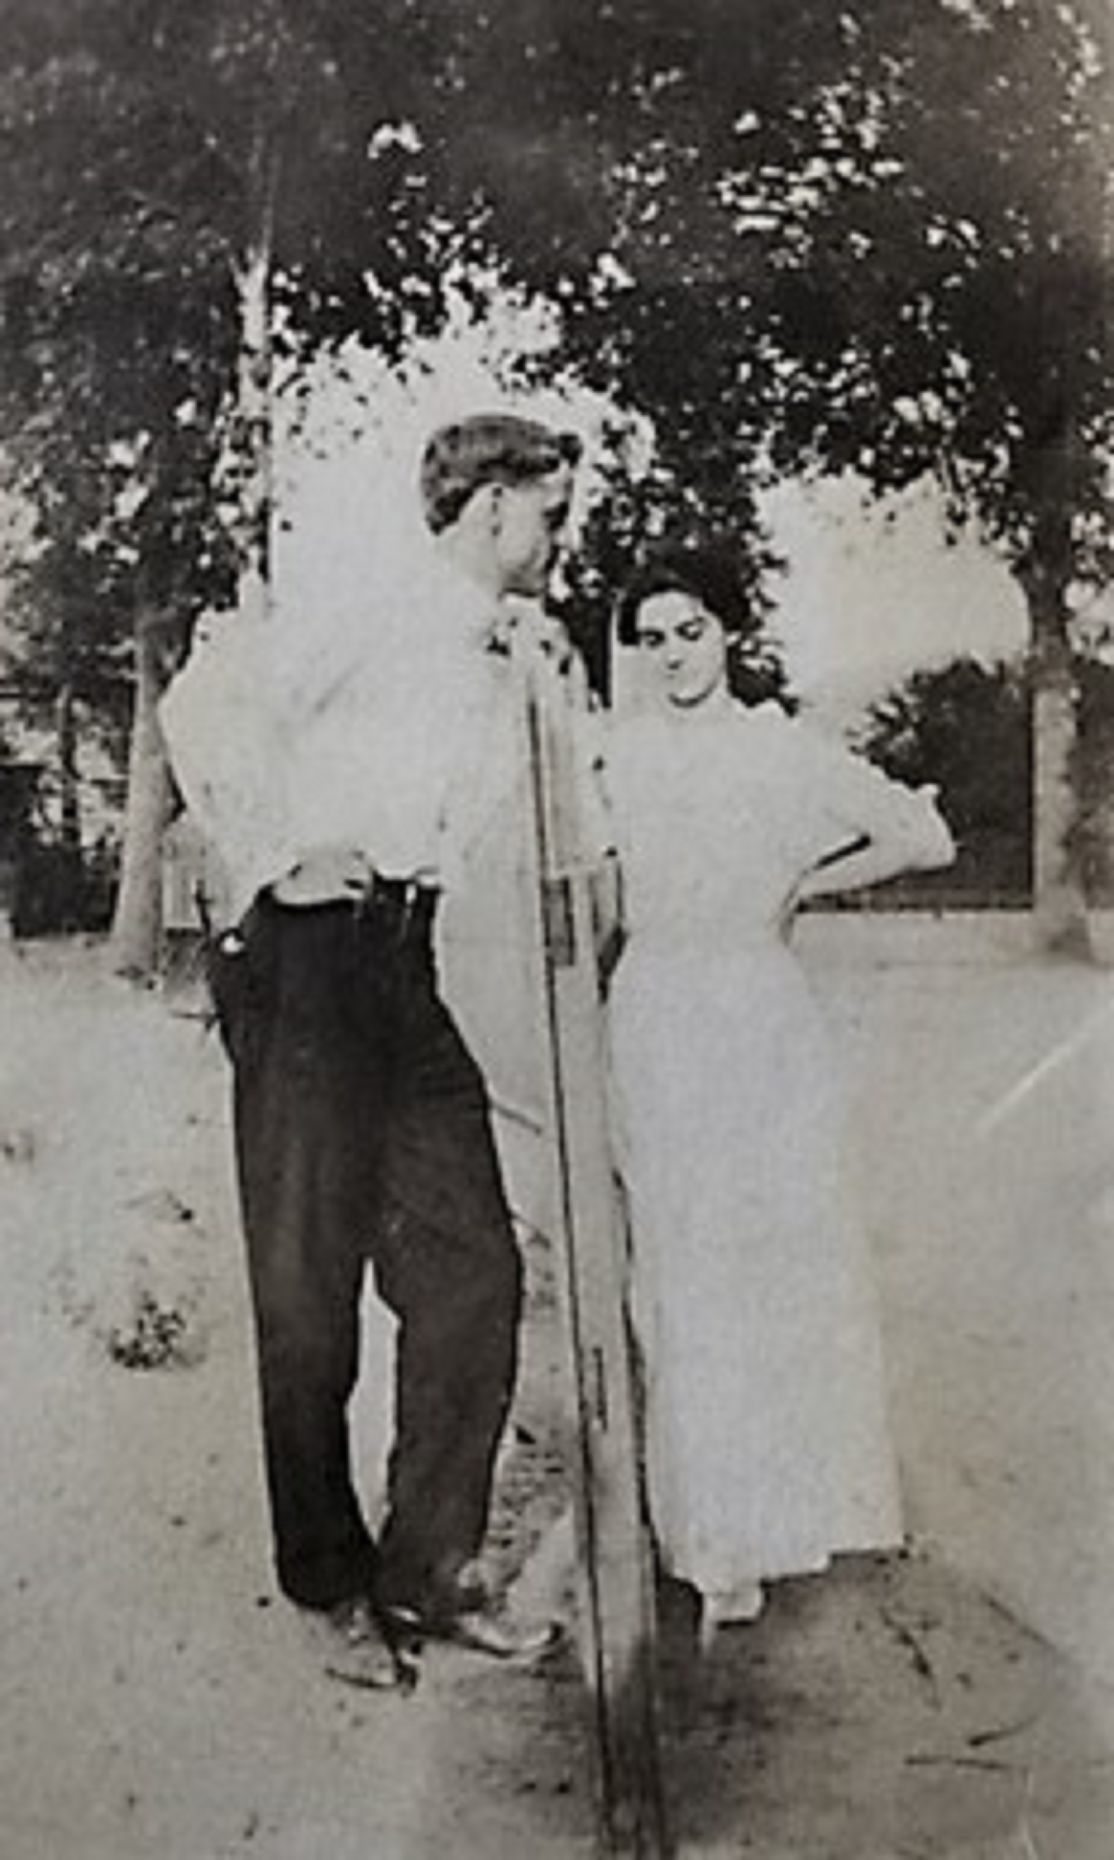 Spanish Flu Epidemic 1918 19 How It Affected My Family In Orangeburg County History Thetandd Com